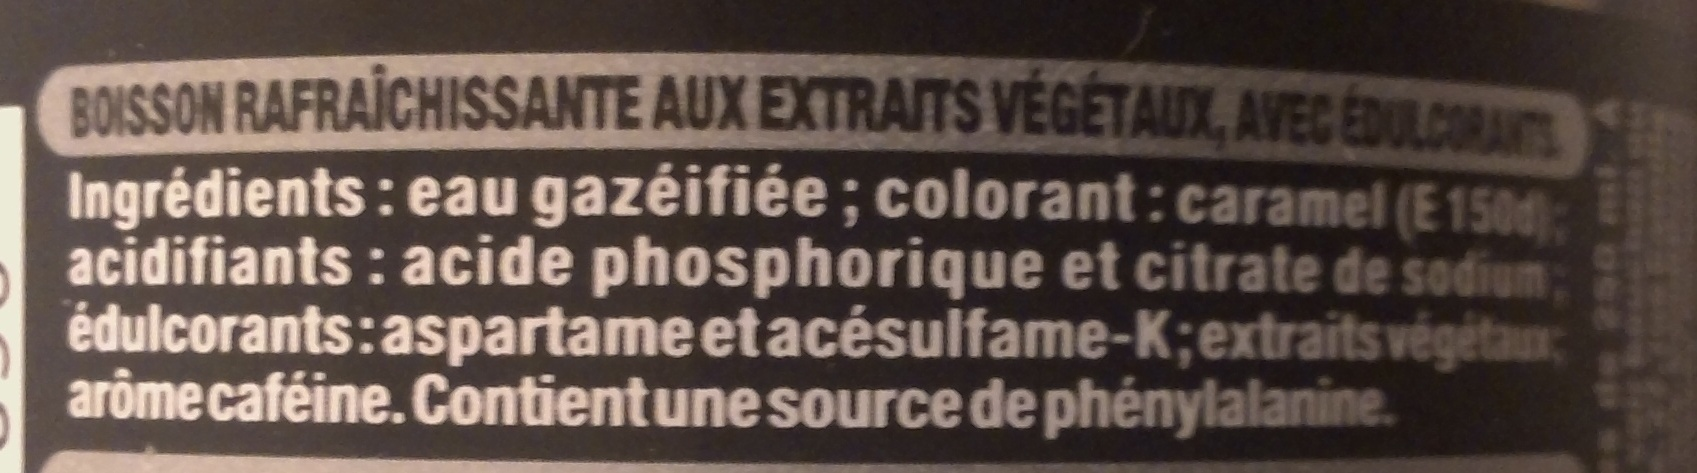 zero - Ingredientes